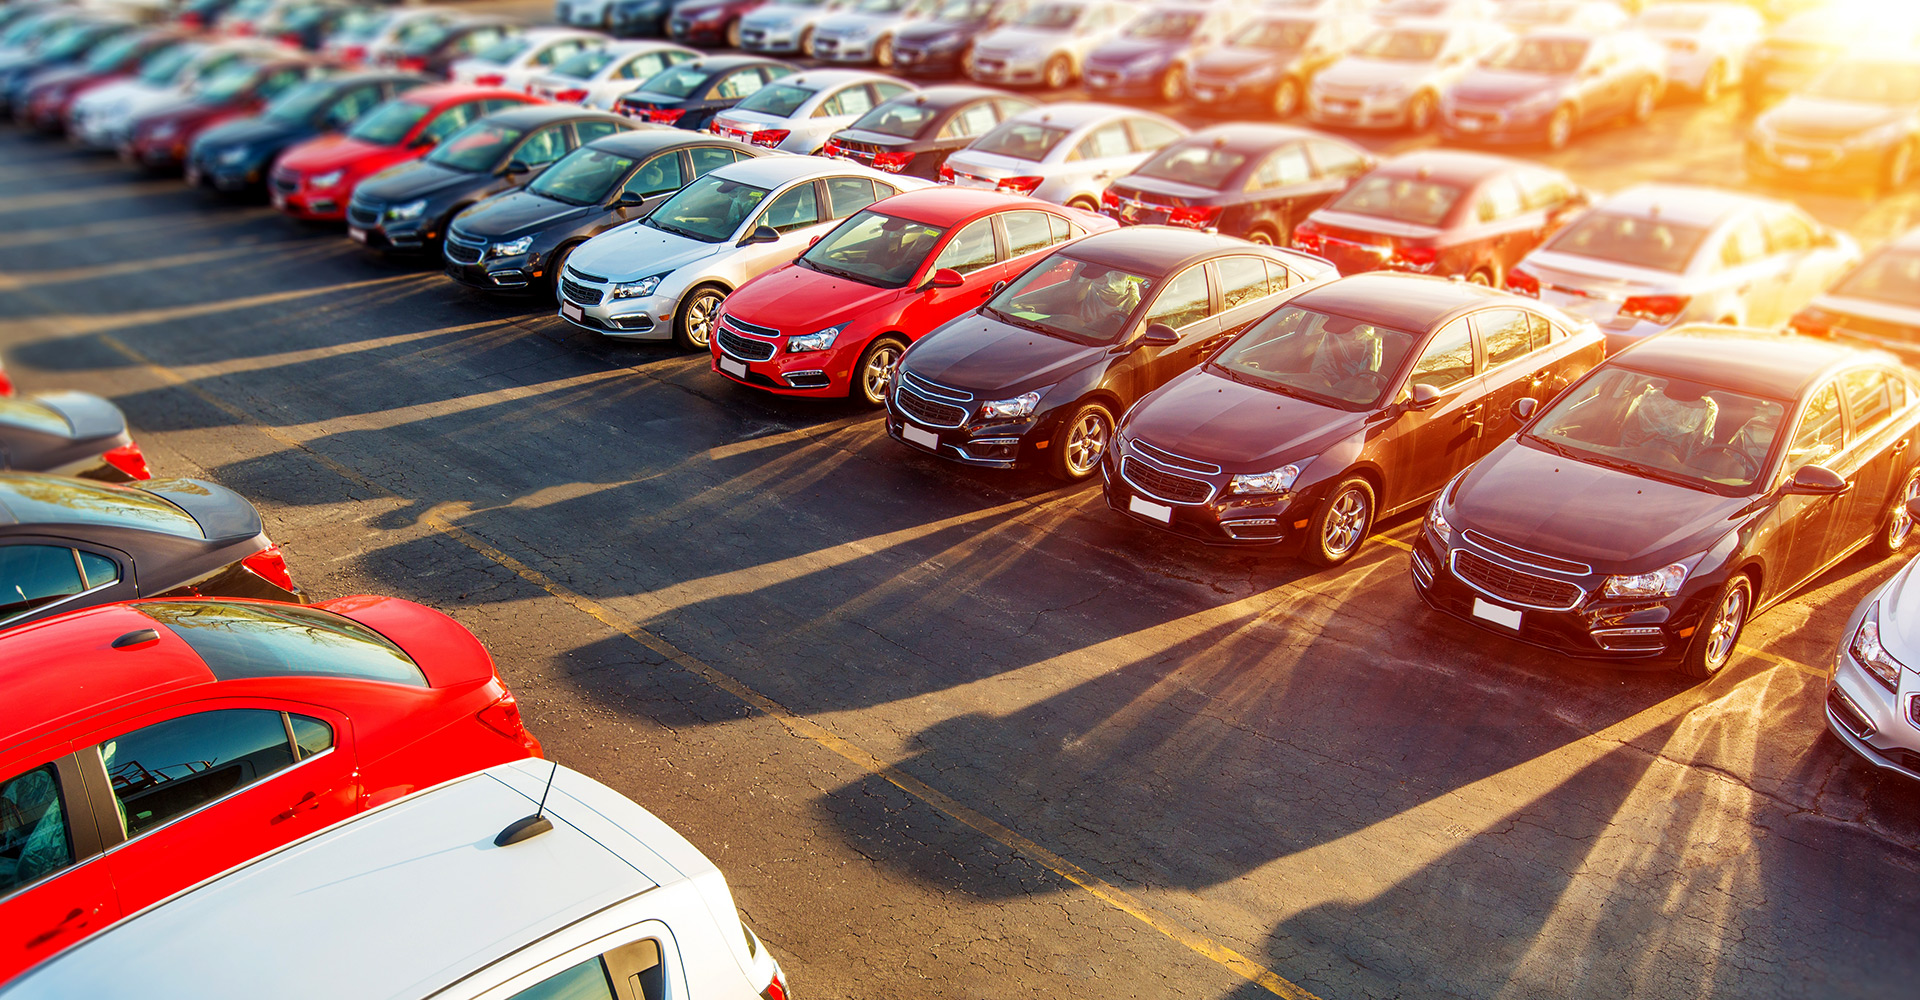 used cars central city ky used cars trucks ky sid rose auto sales used cars central city ky used cars